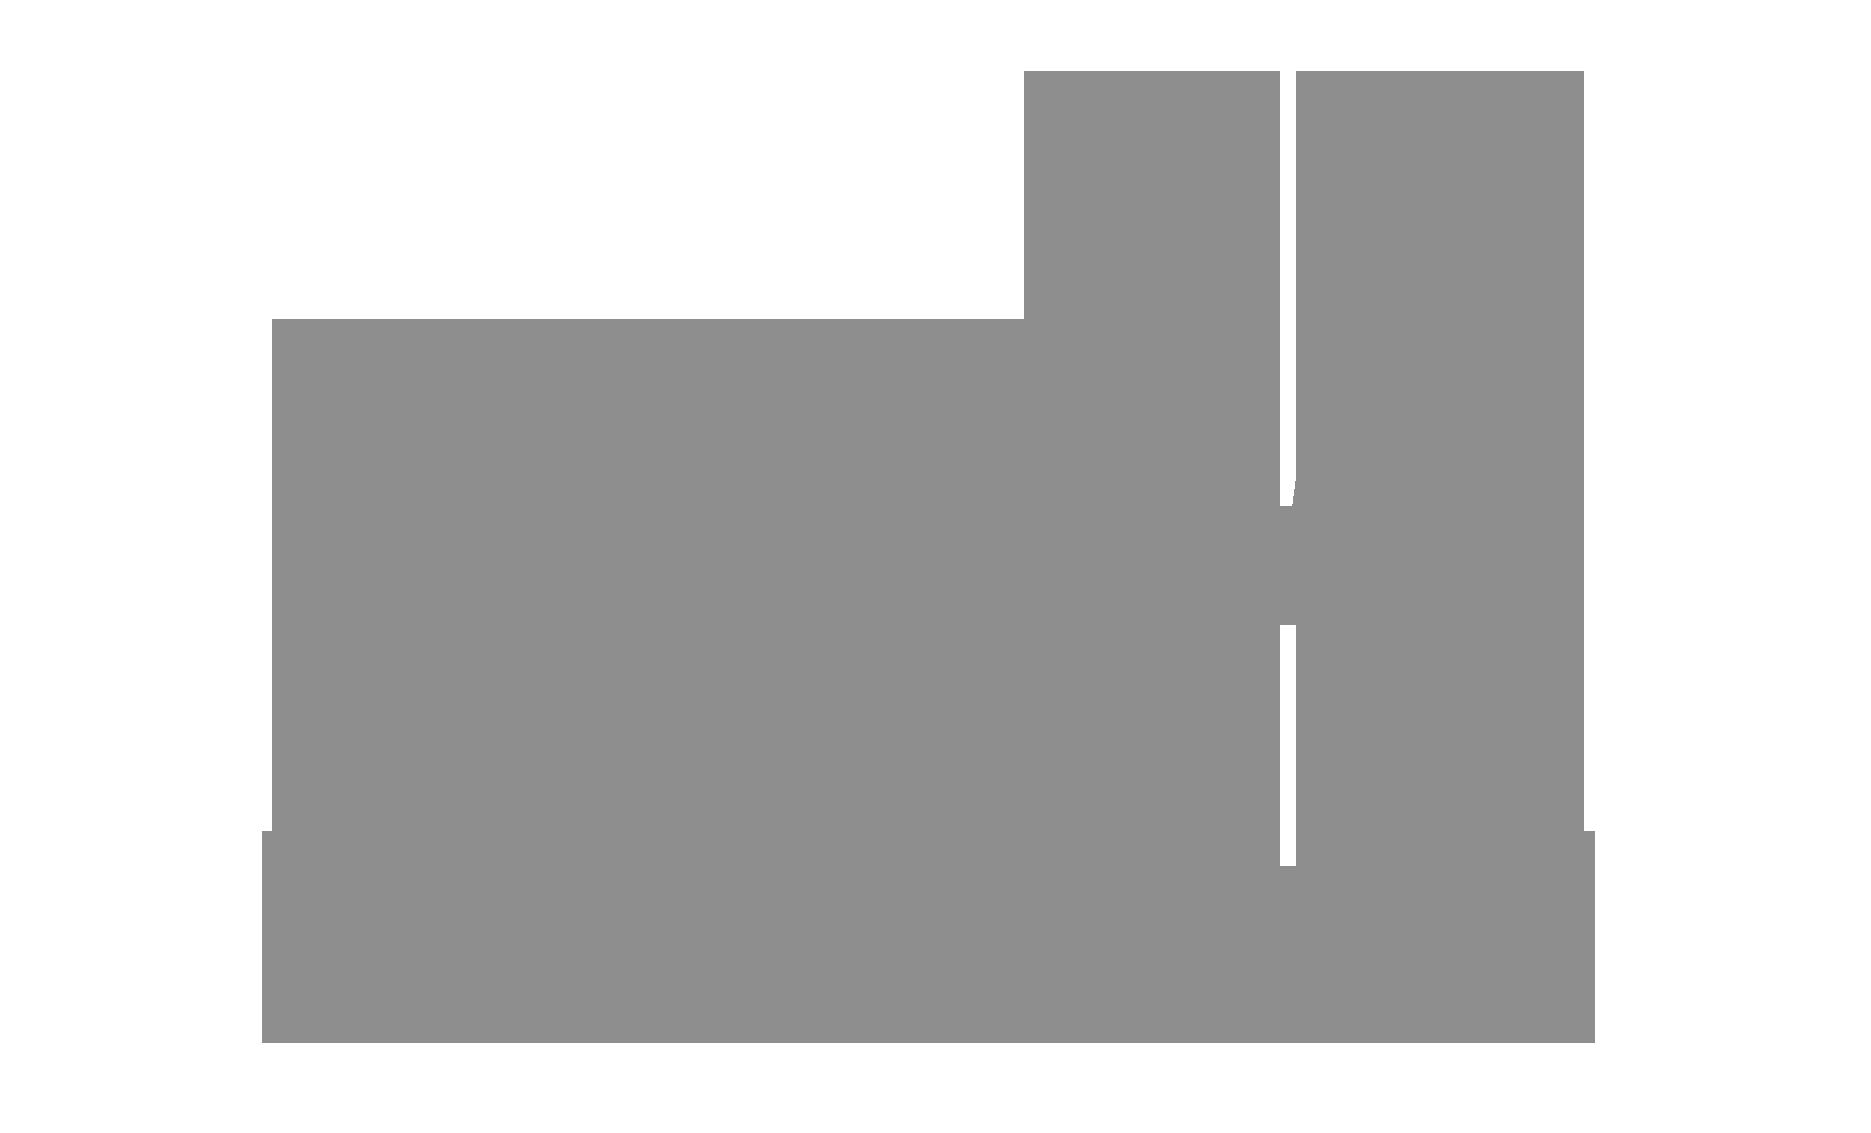 graphic01-gray